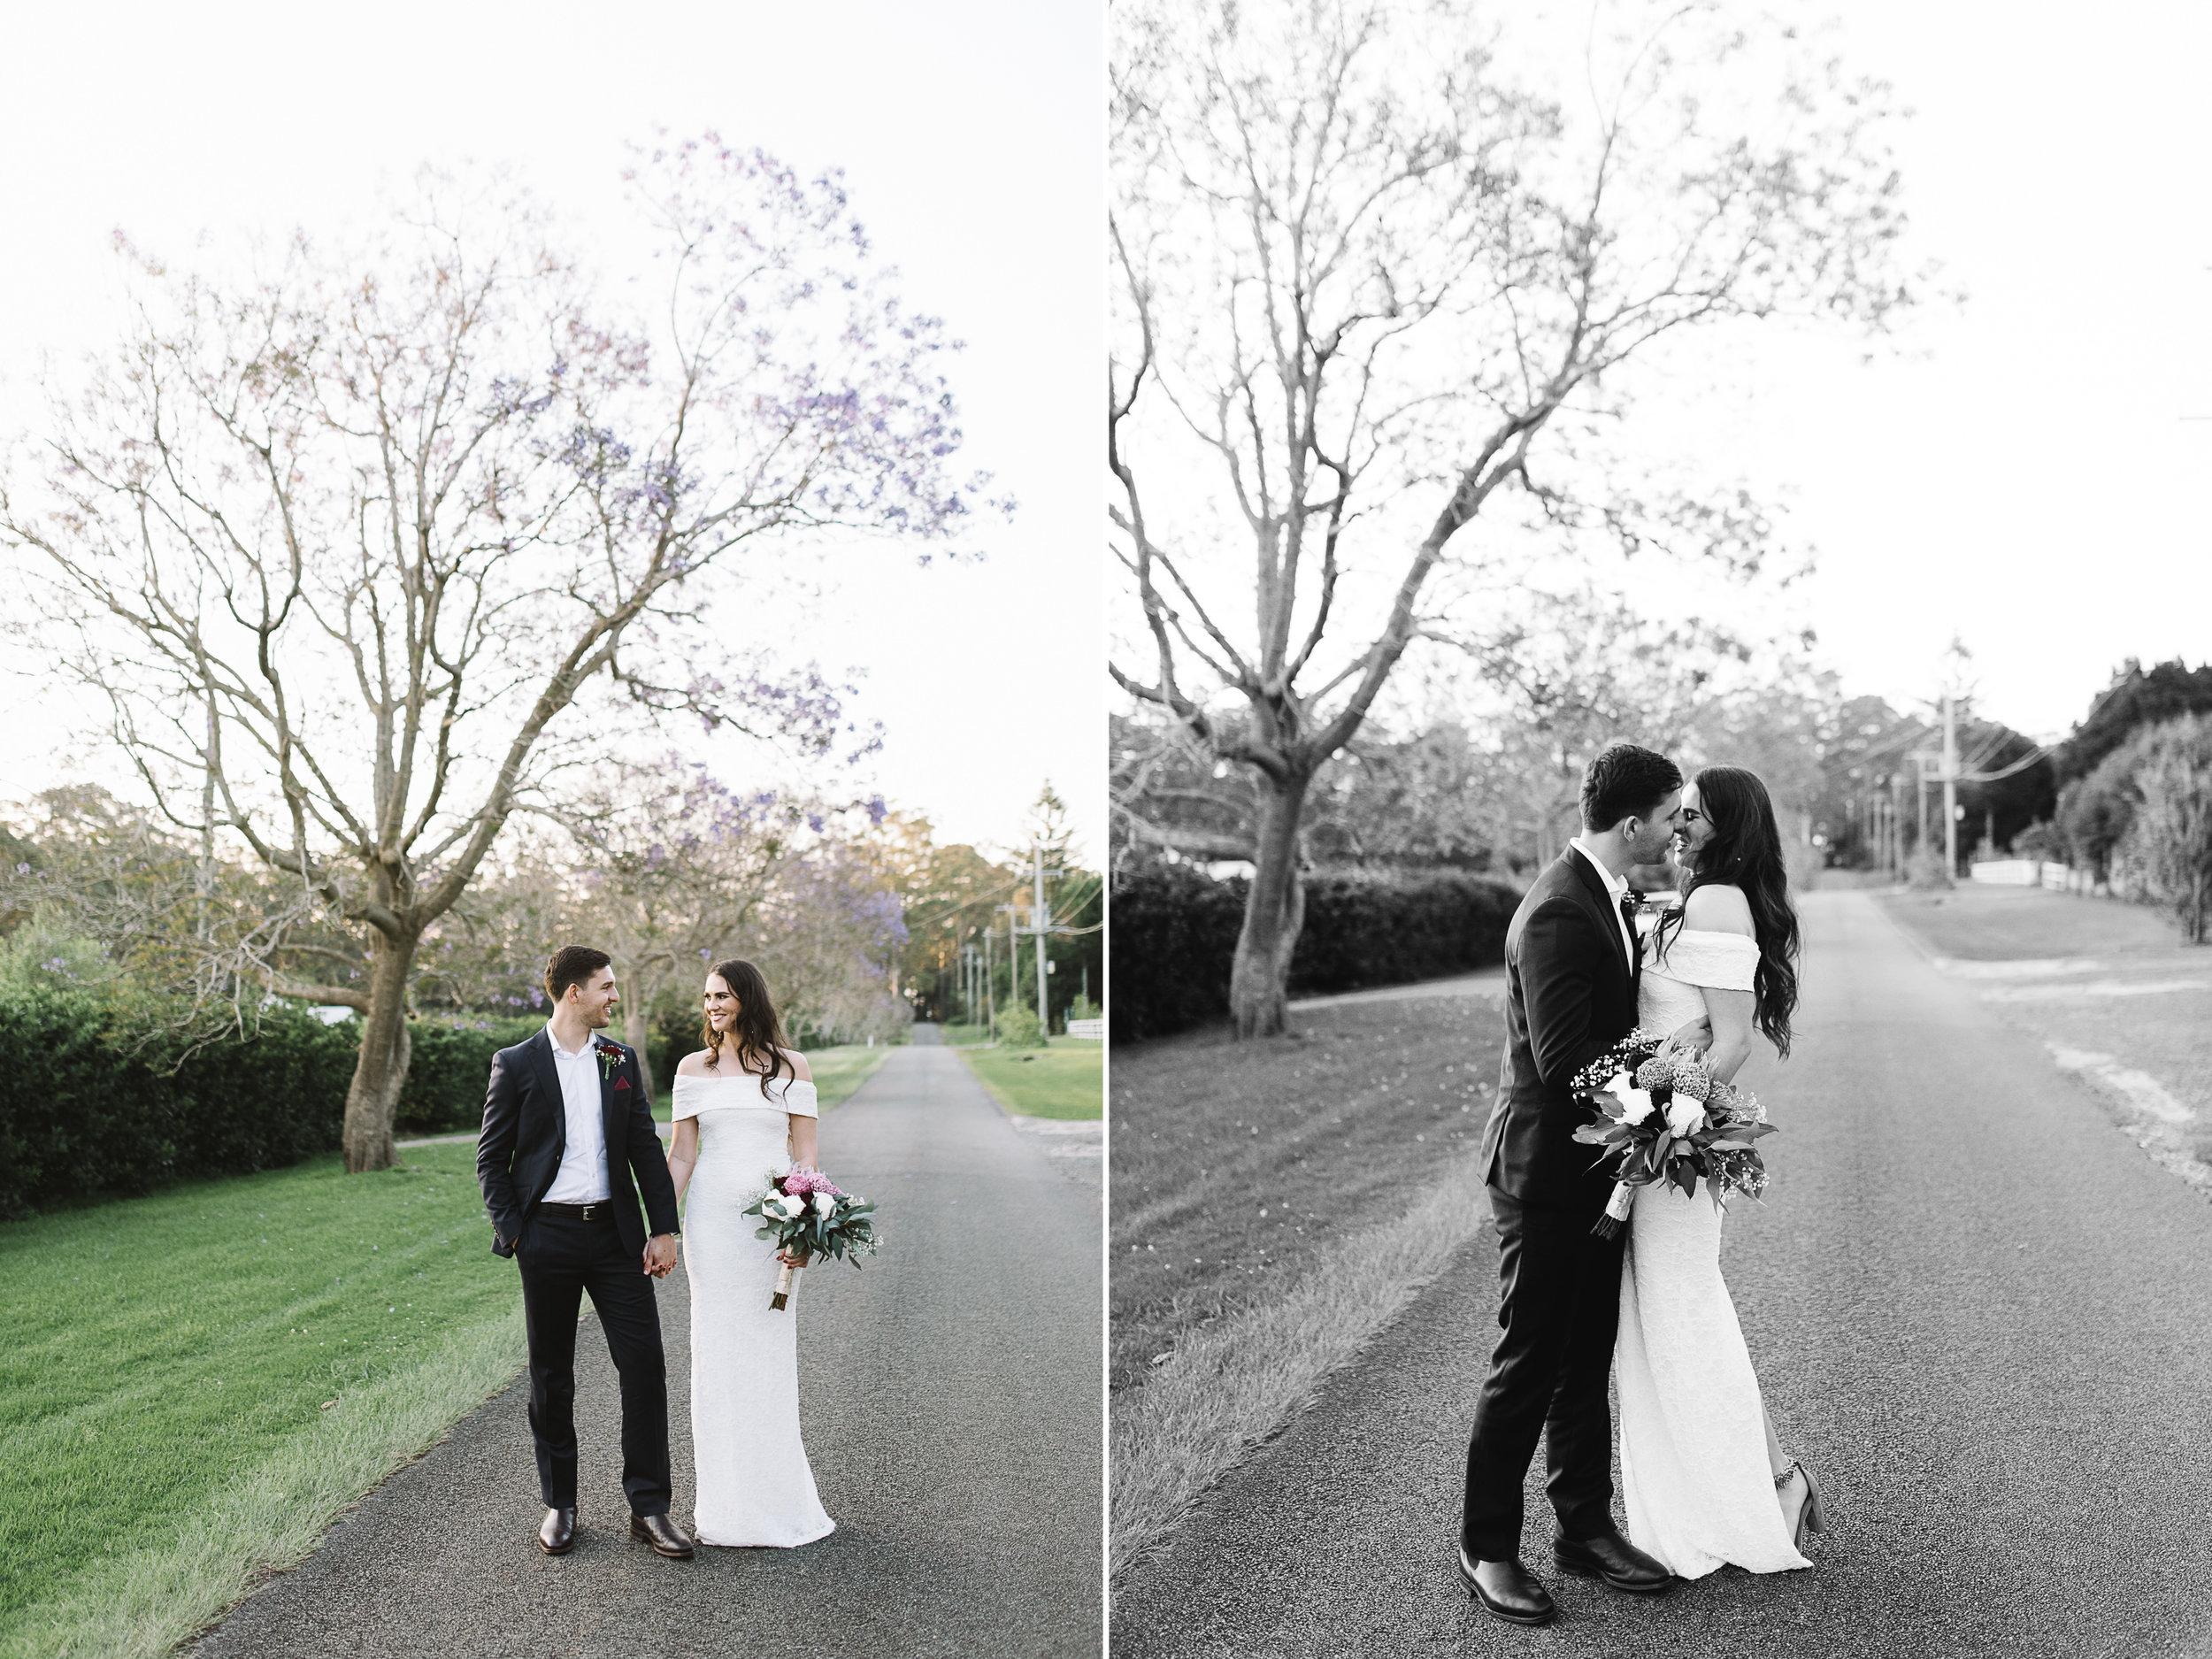 brisbane-gold-coast-sunshine-coast-wedding-photographer-mount-tamborine-wedding-31.jpg